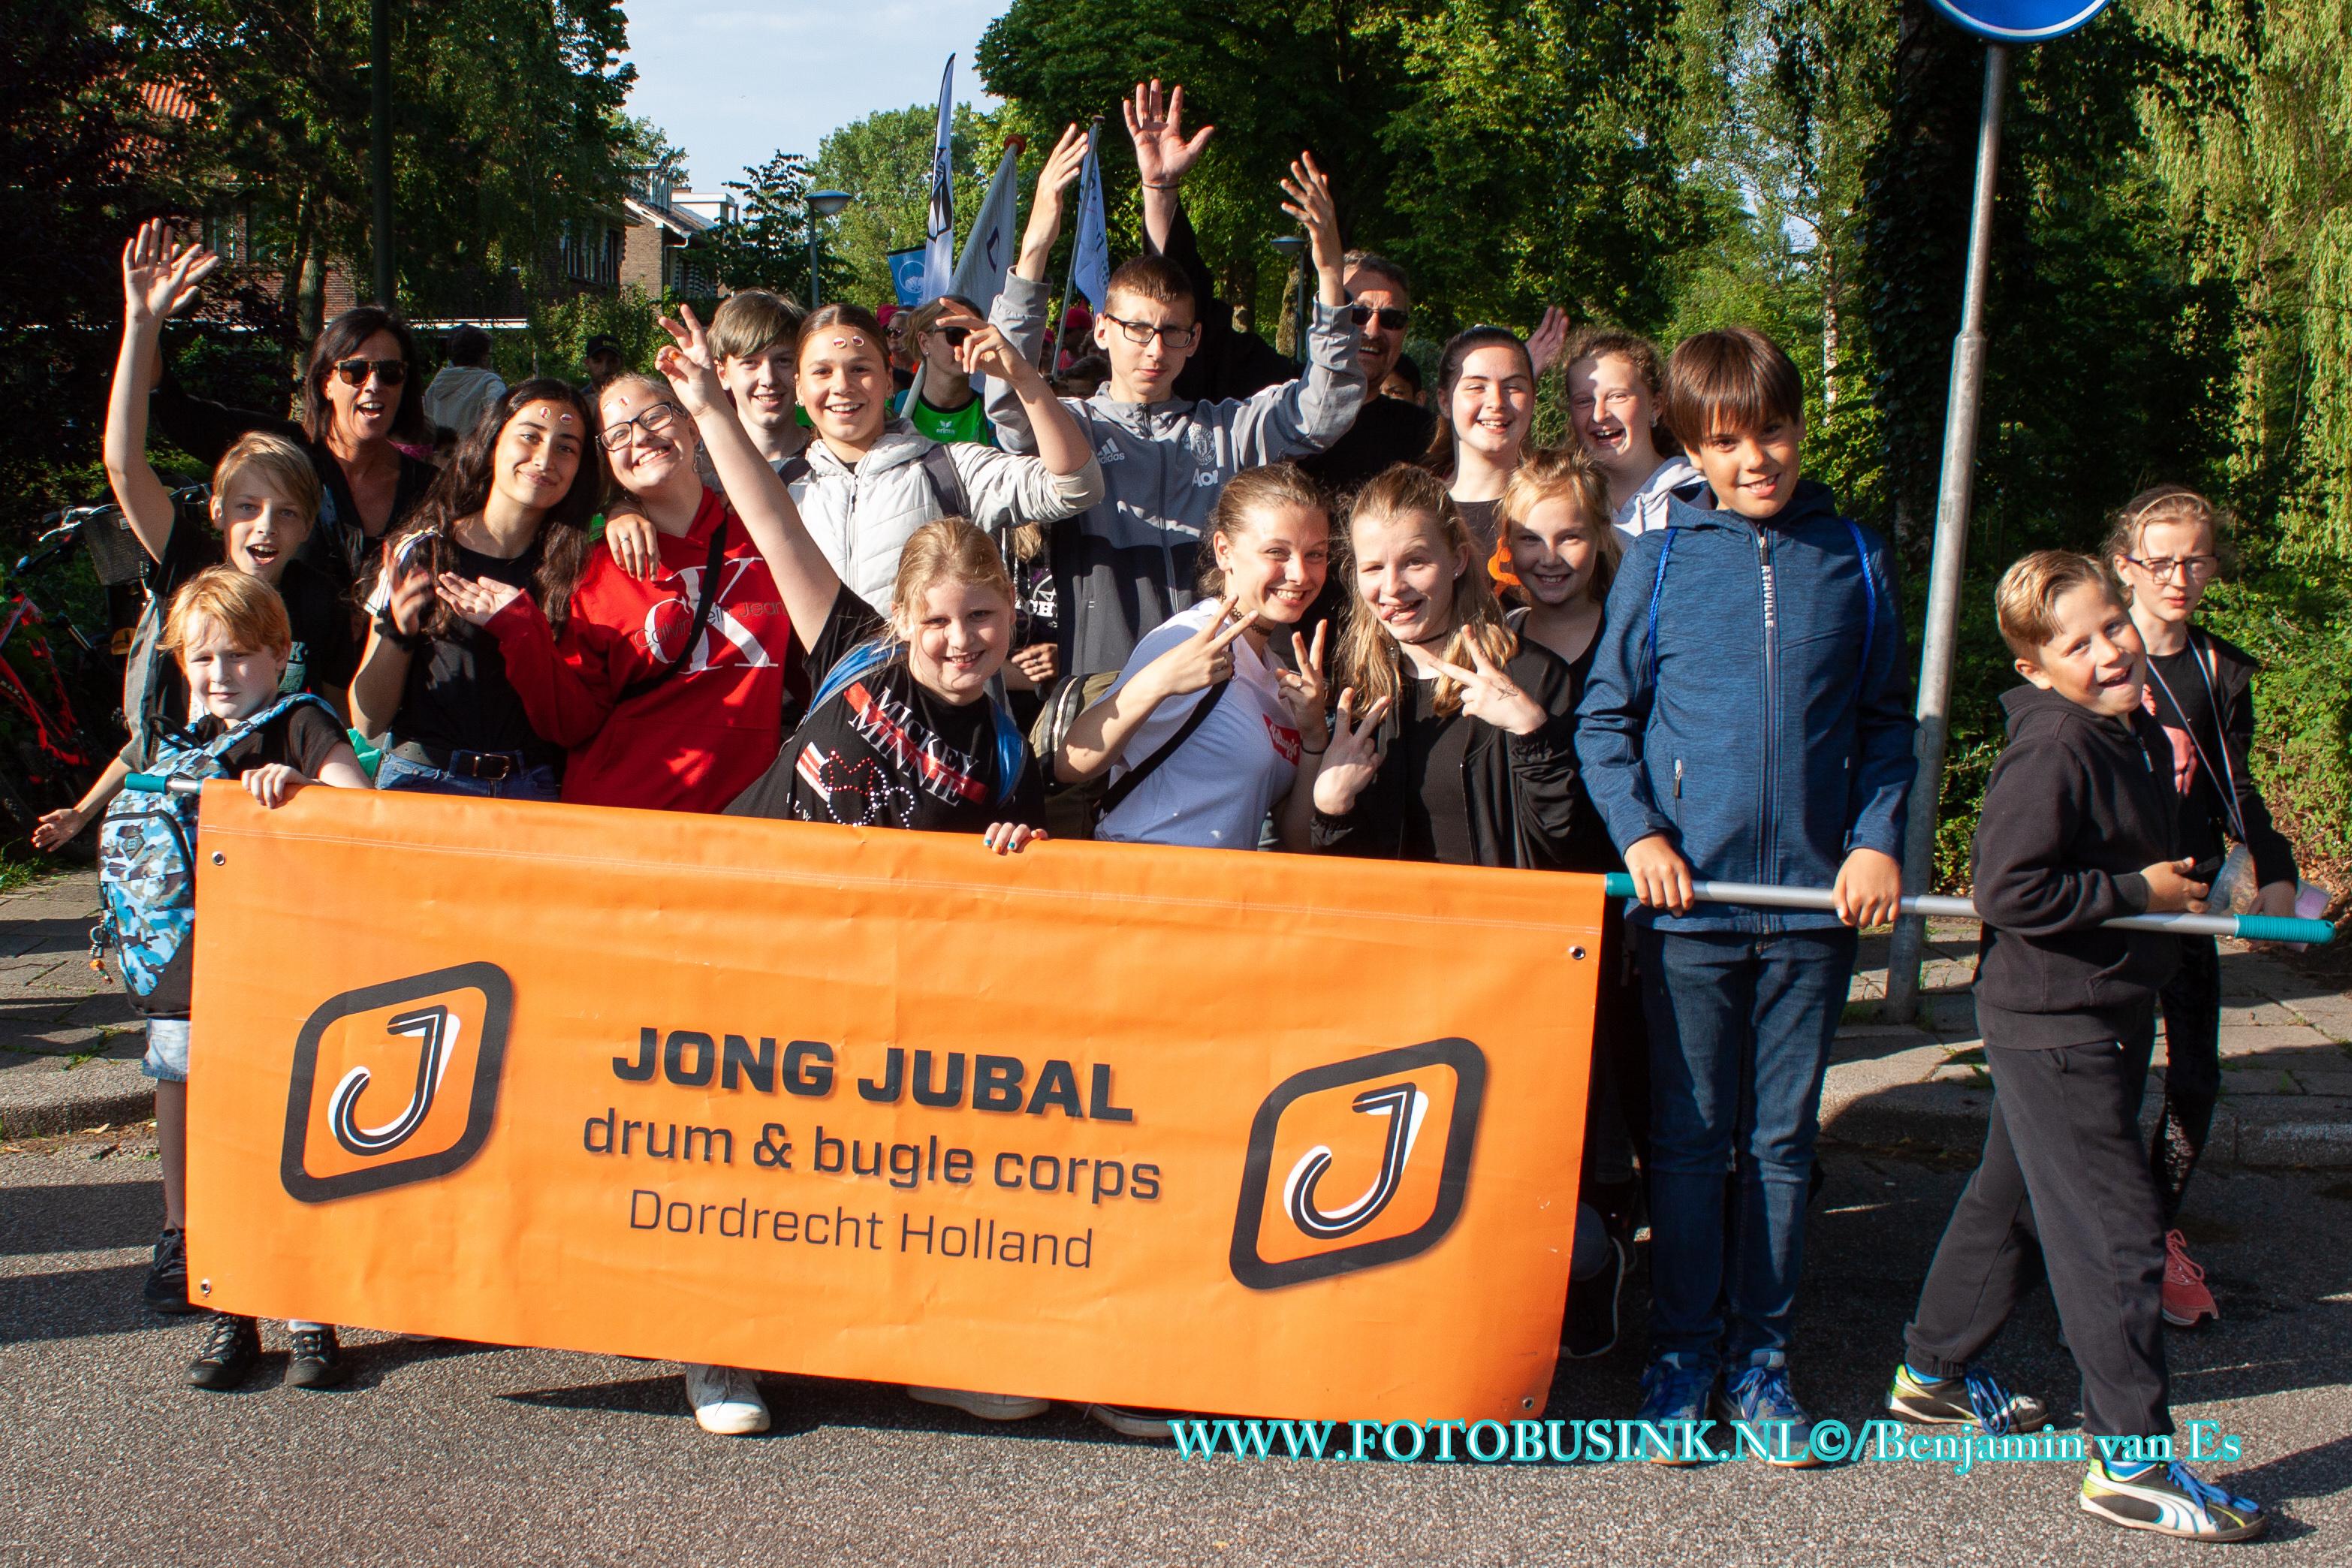 Tweede loopdag van avondvierdaagse in Dordrecht.